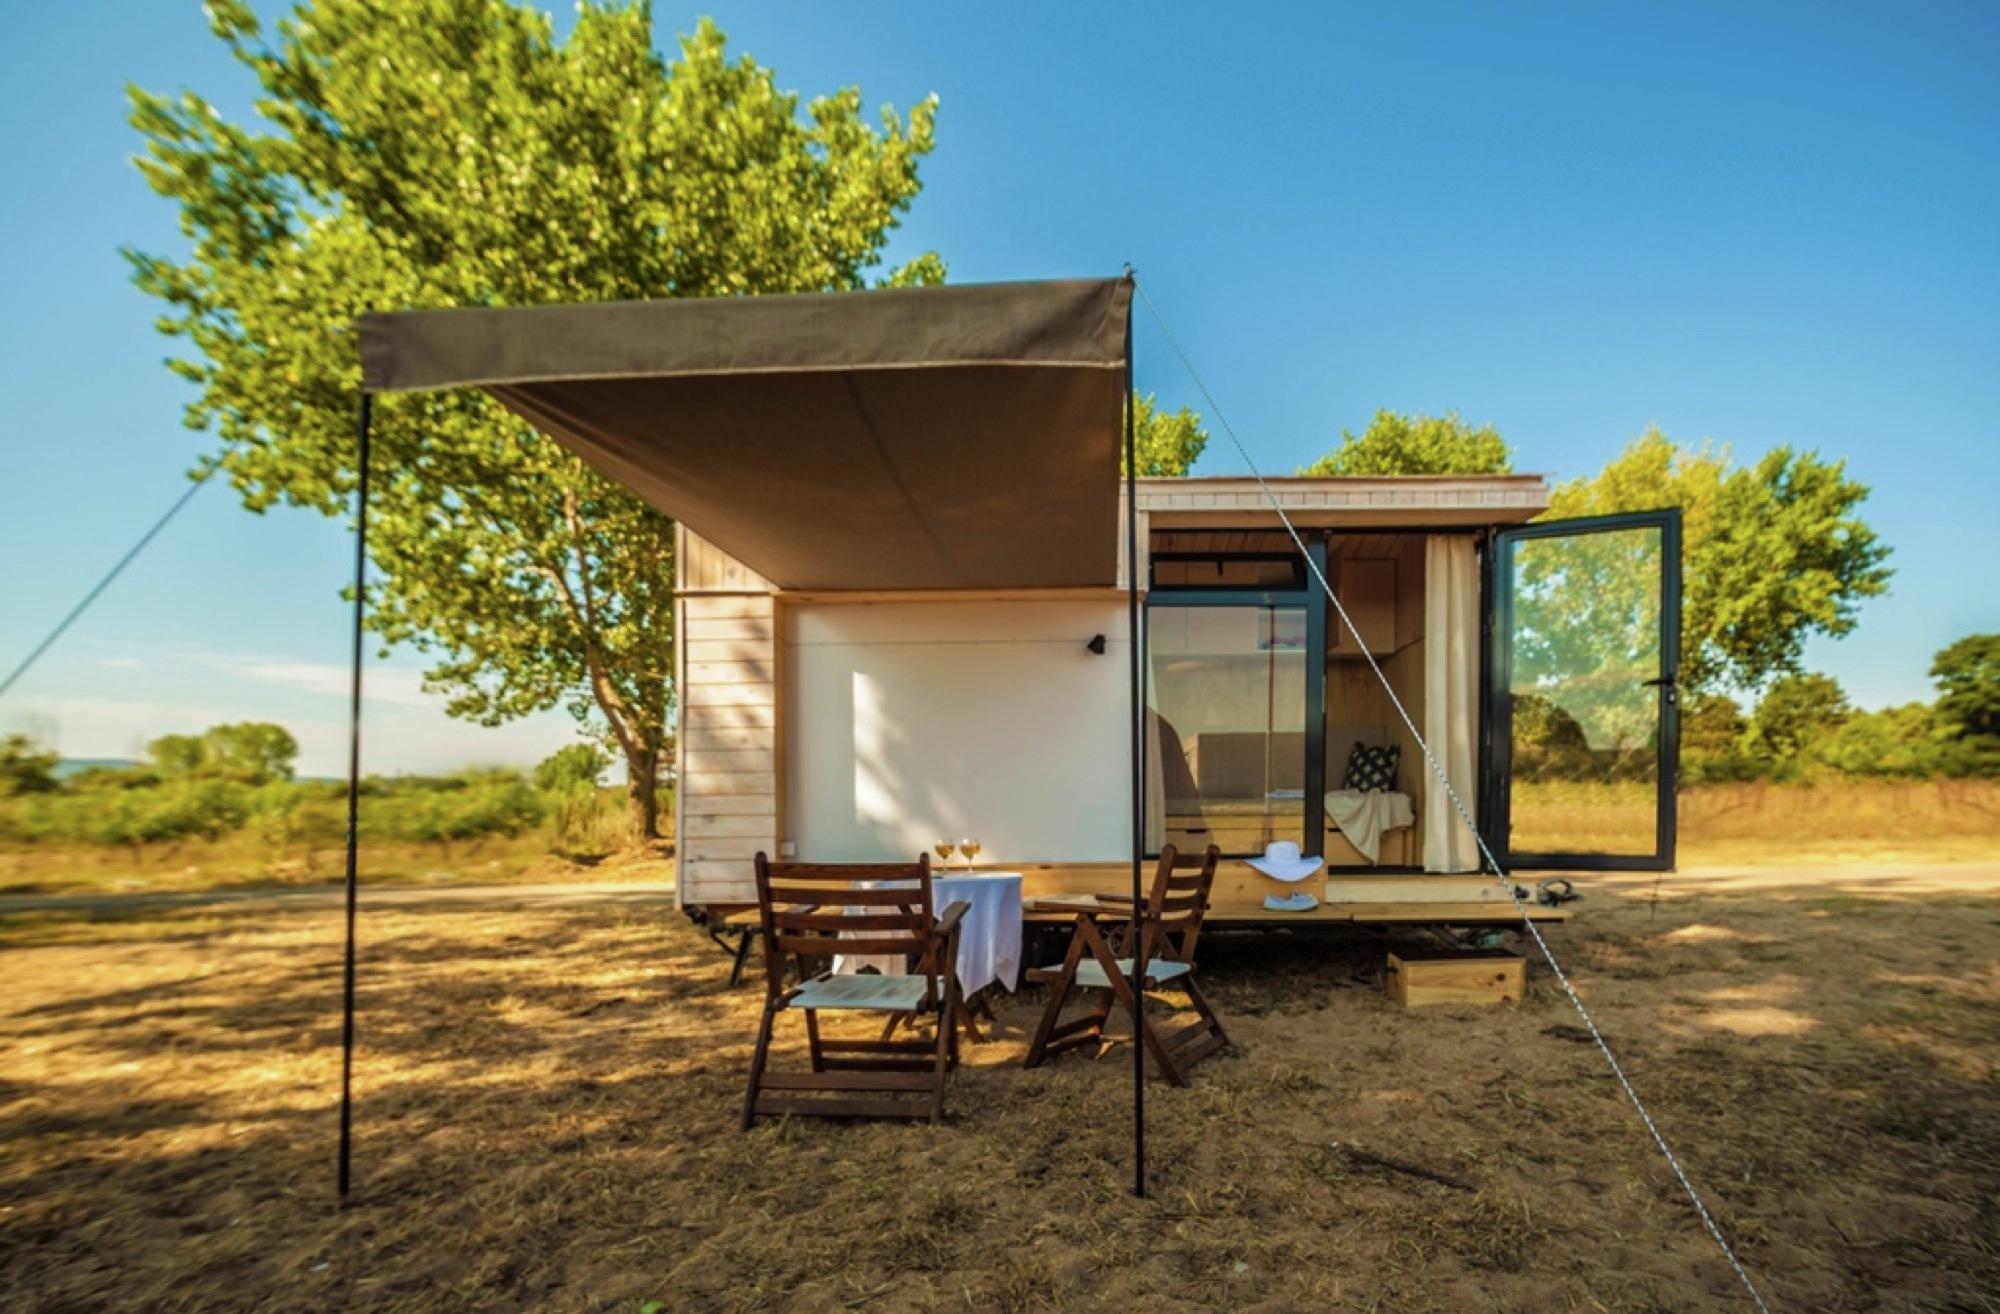 Vacation House / Hristina Hristova